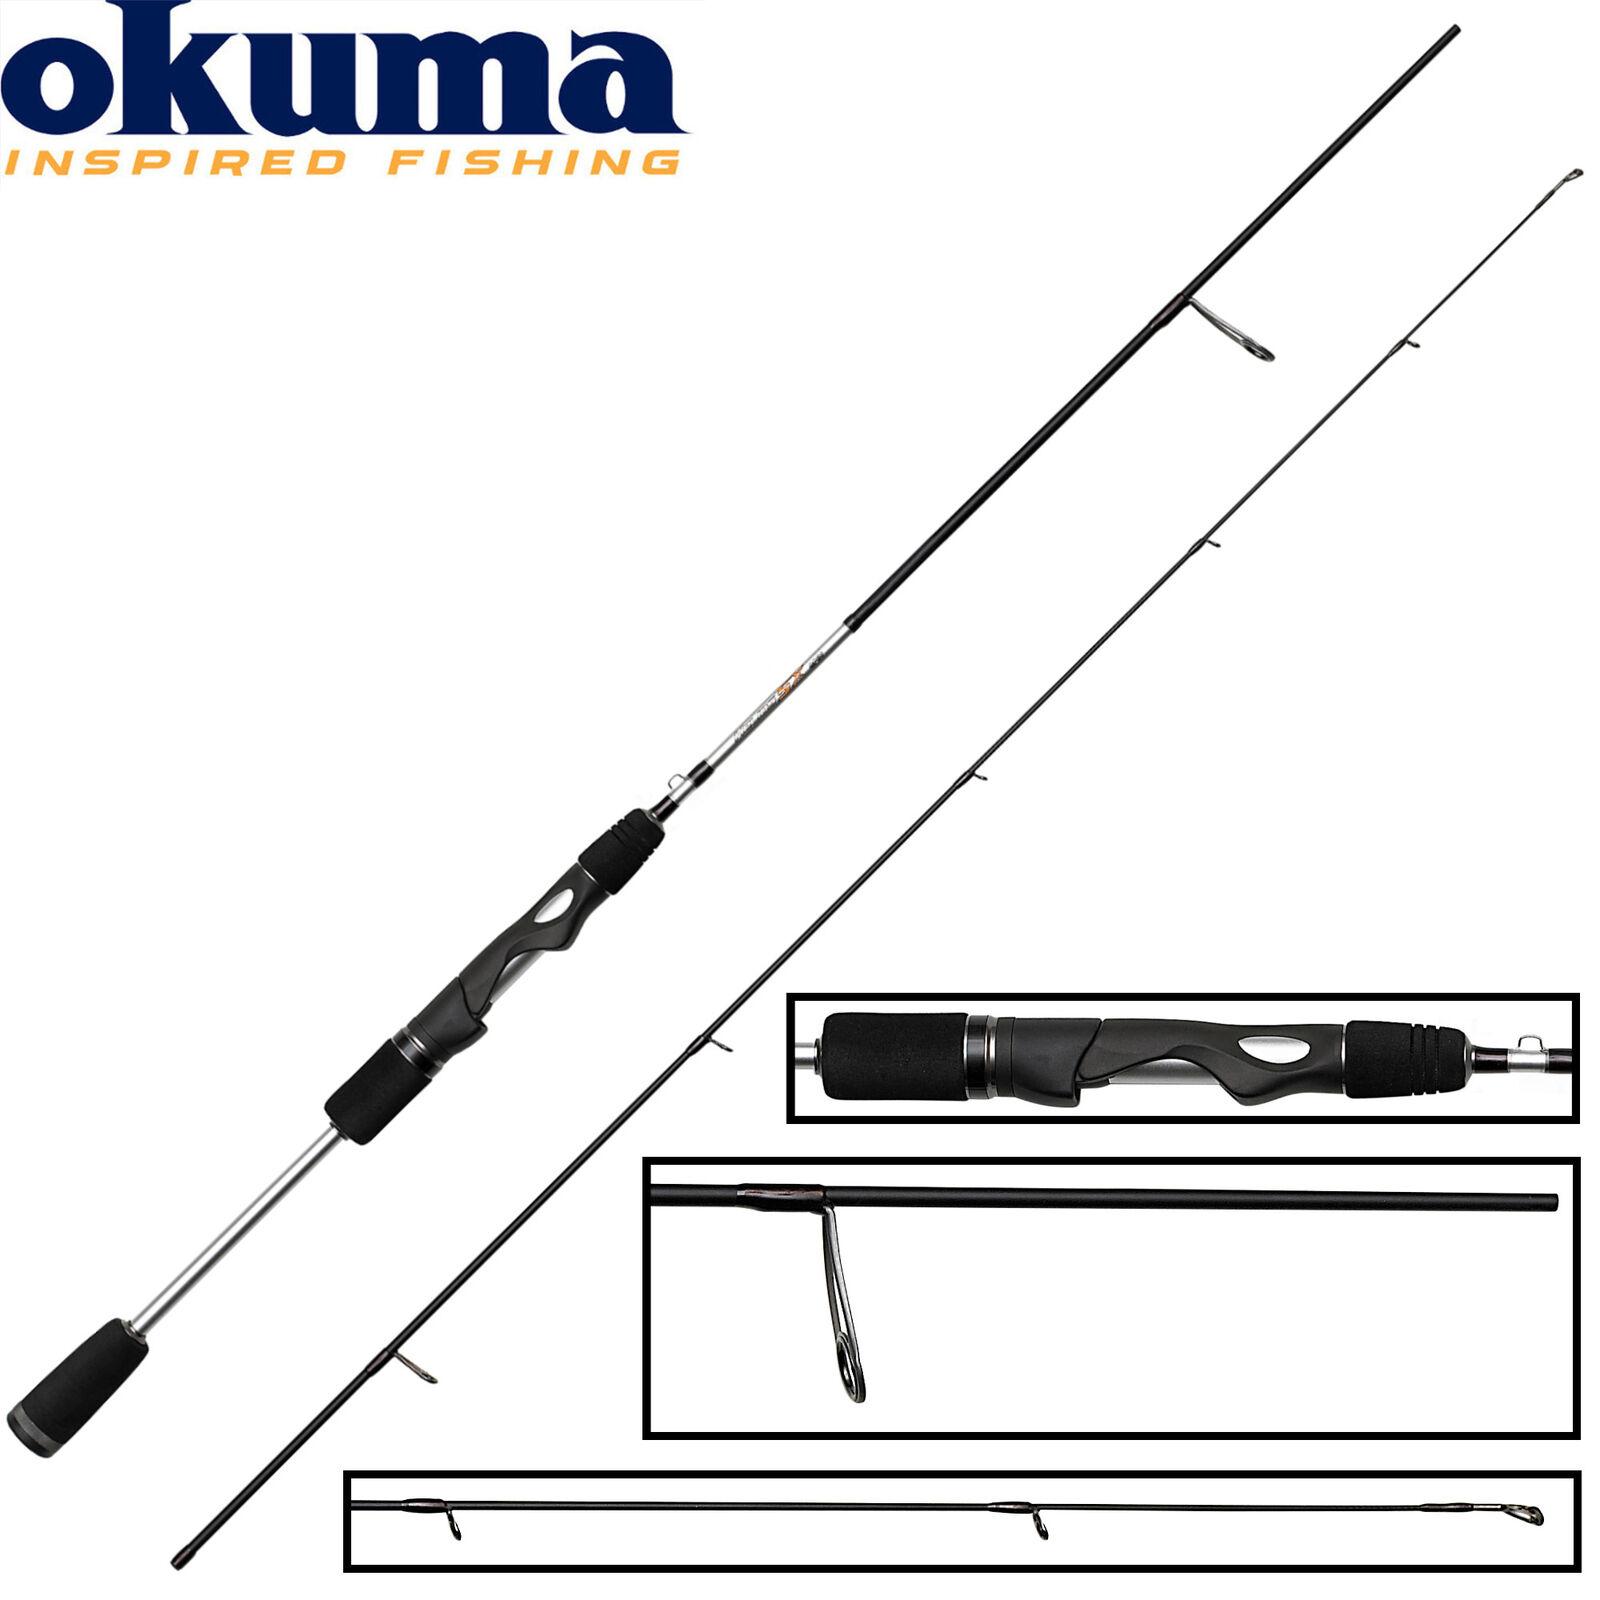 Okuma Helios SX Spin 1,95m 7-18g spinnrute, Protator Rod, Fishing Pole, Rod